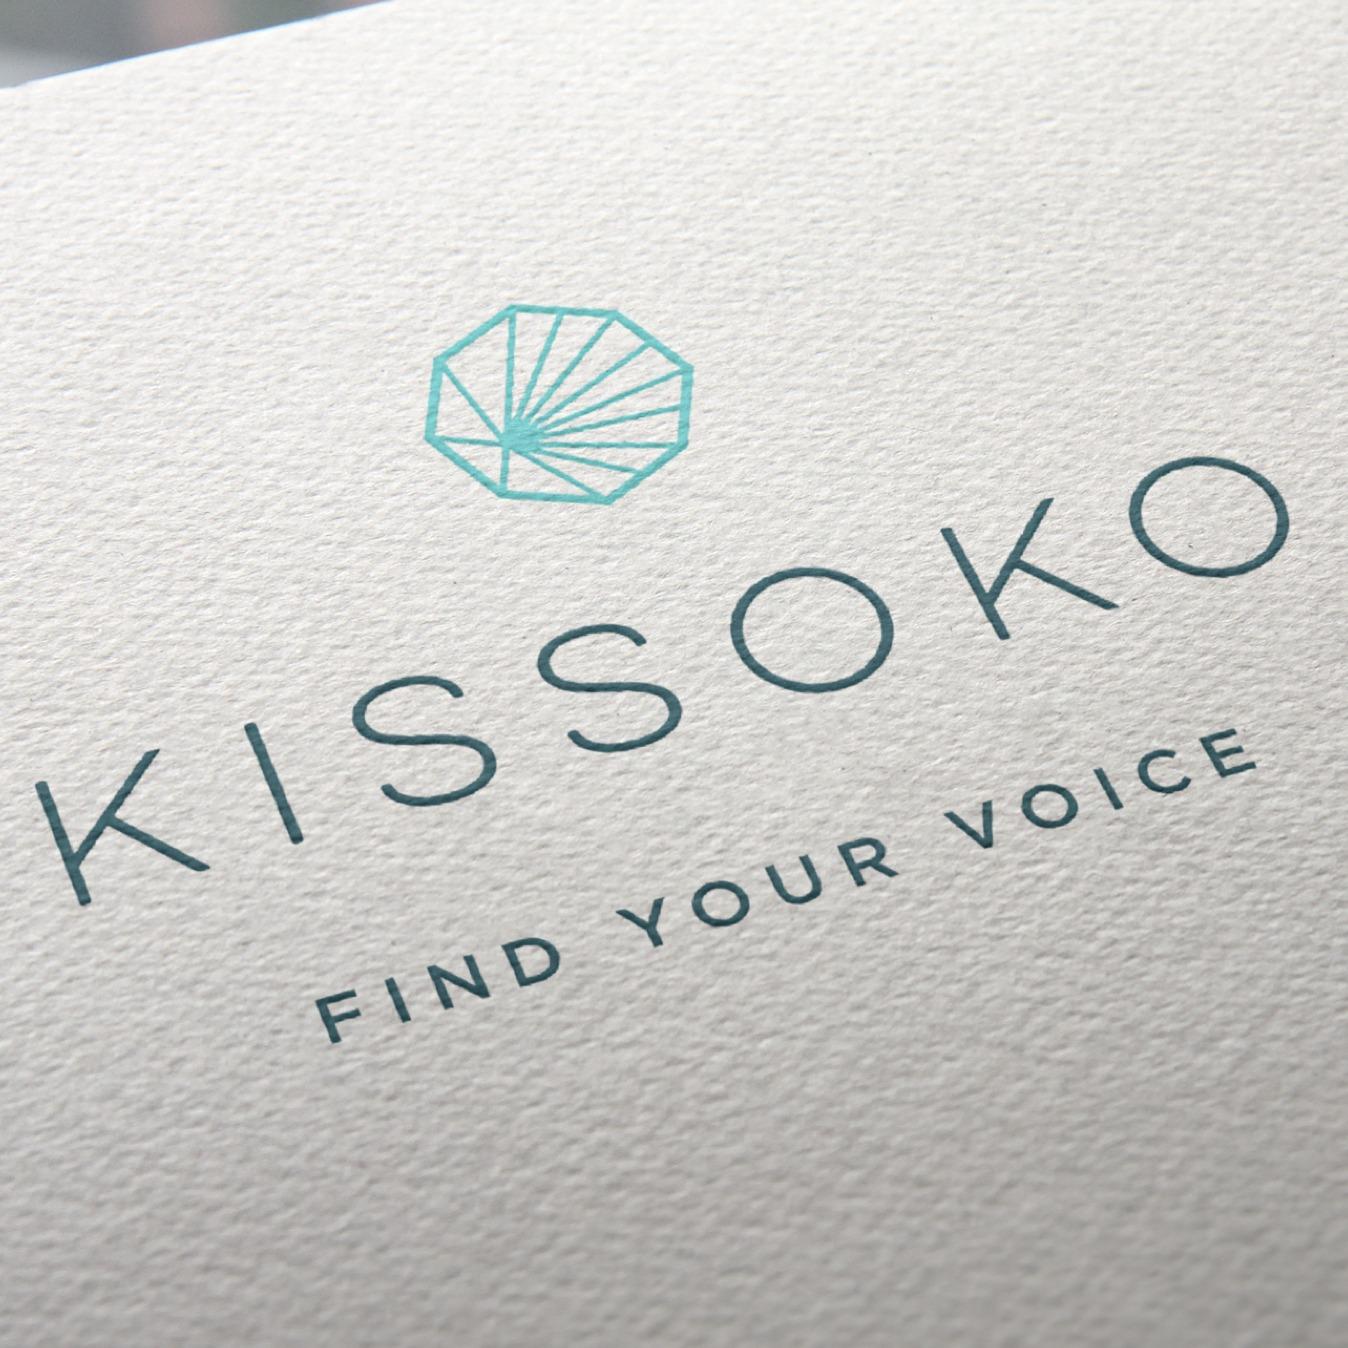 Kissoko